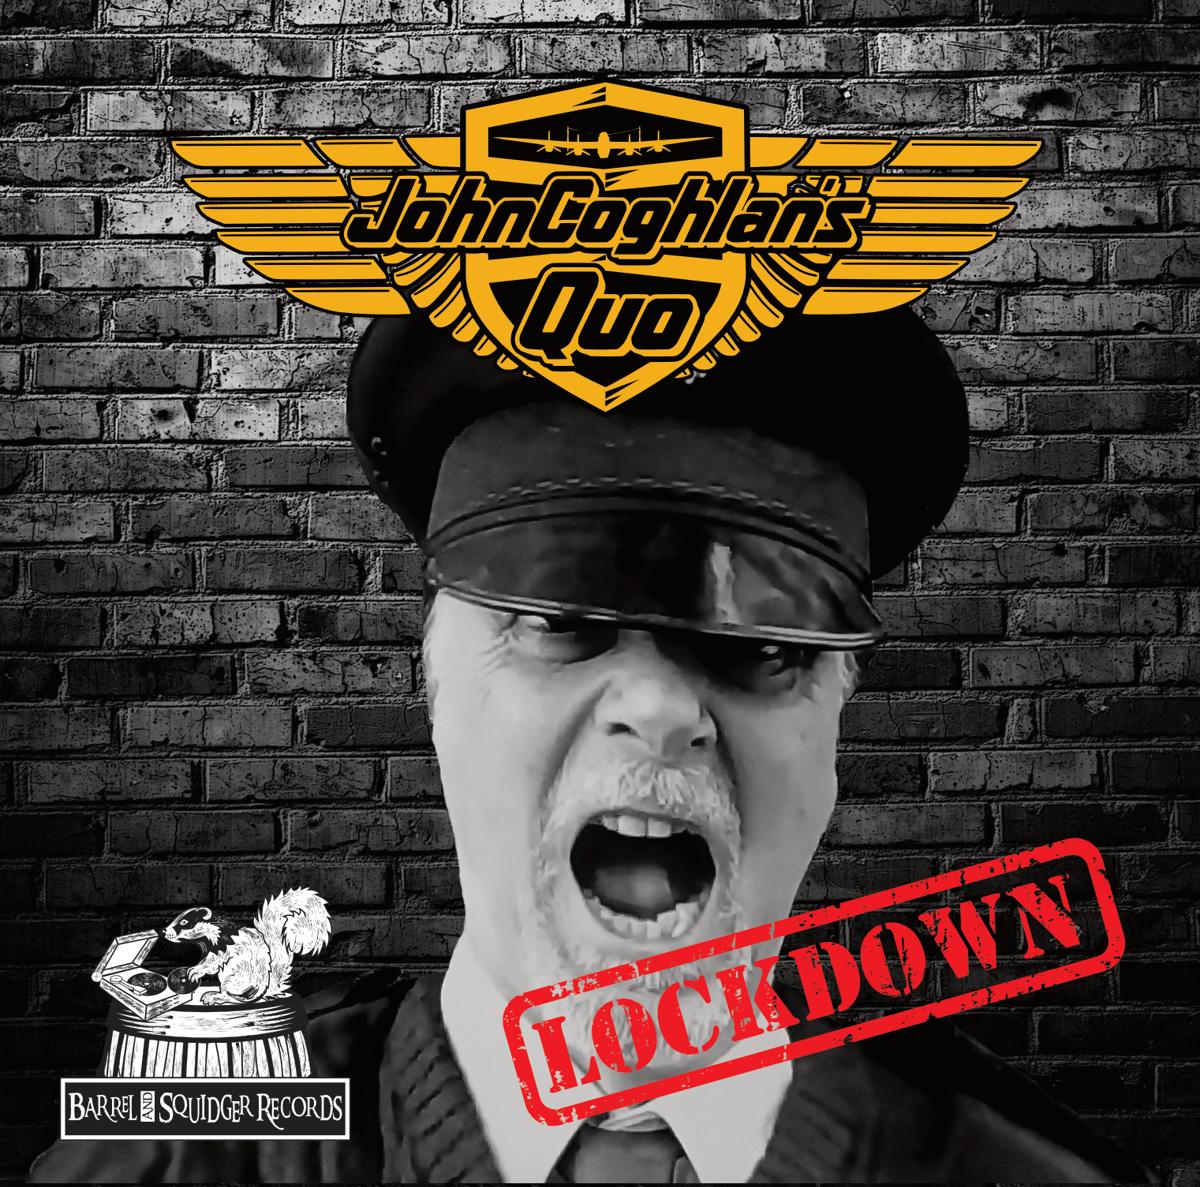 John Coghlan's Quo - Lockdown / No Return - CD single - Barrel And Squidger Records